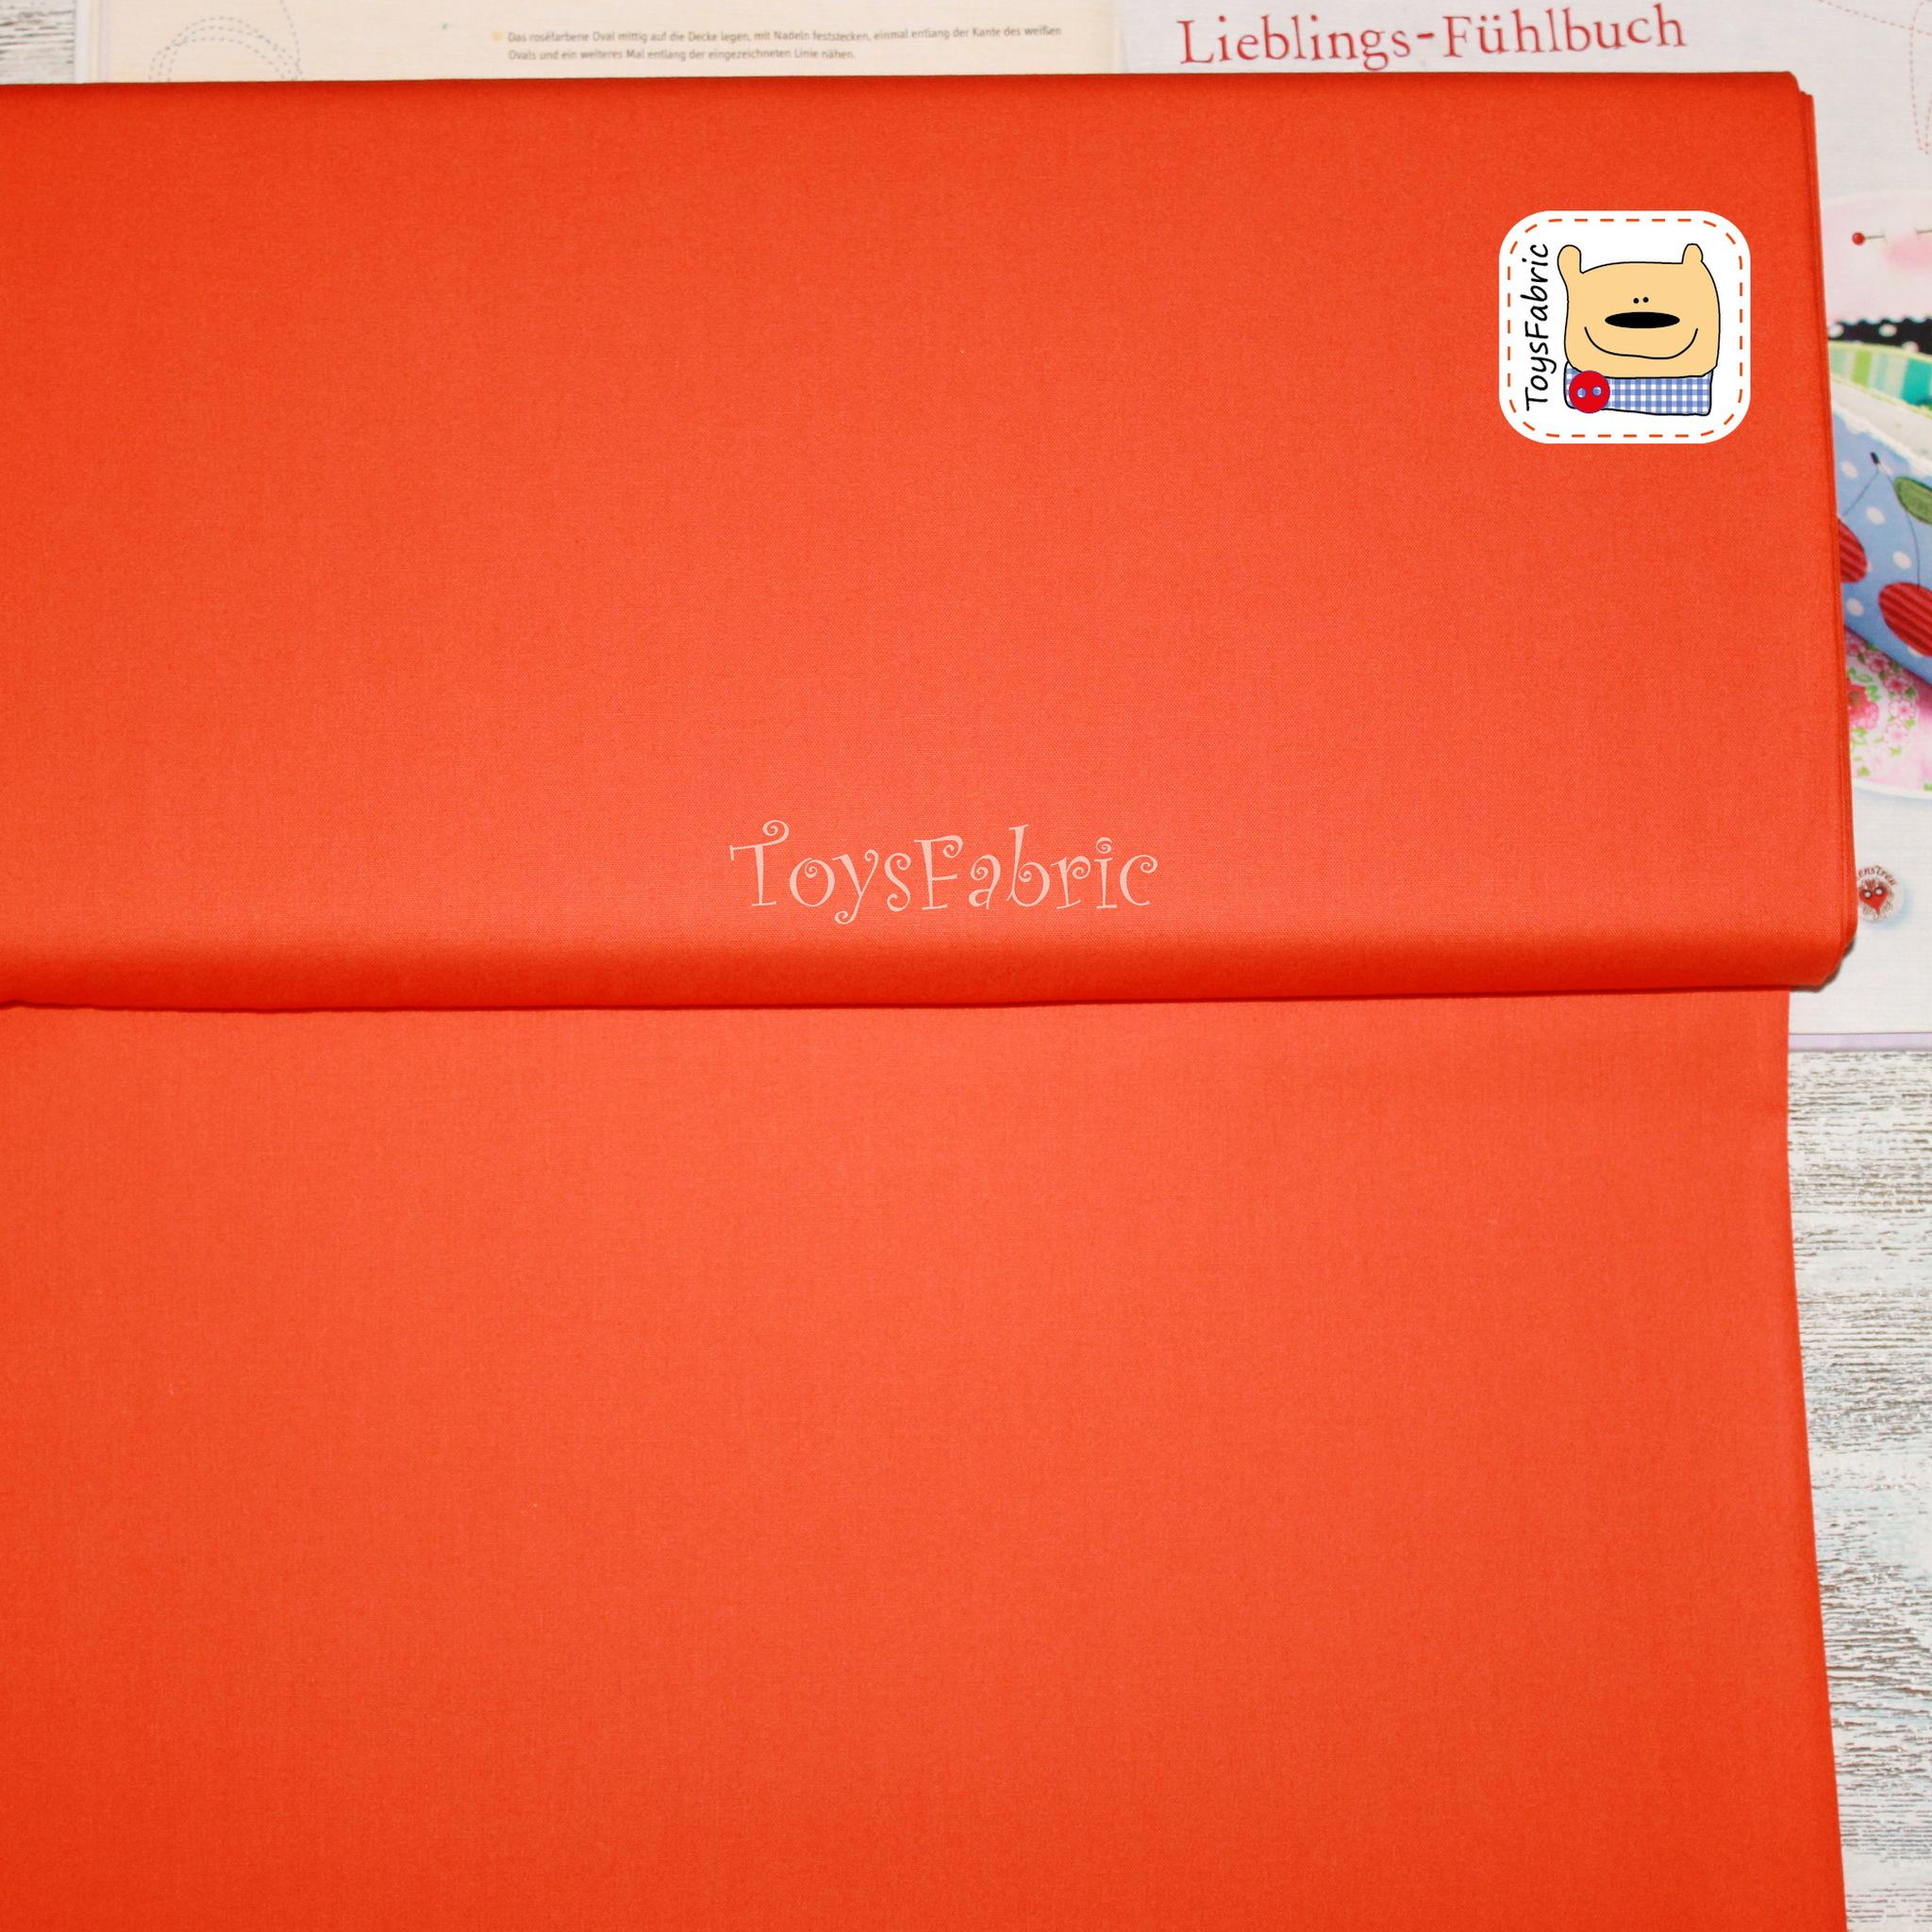 Ткань для пэчворка 20663 (однотонный оранжевый) 45х55см